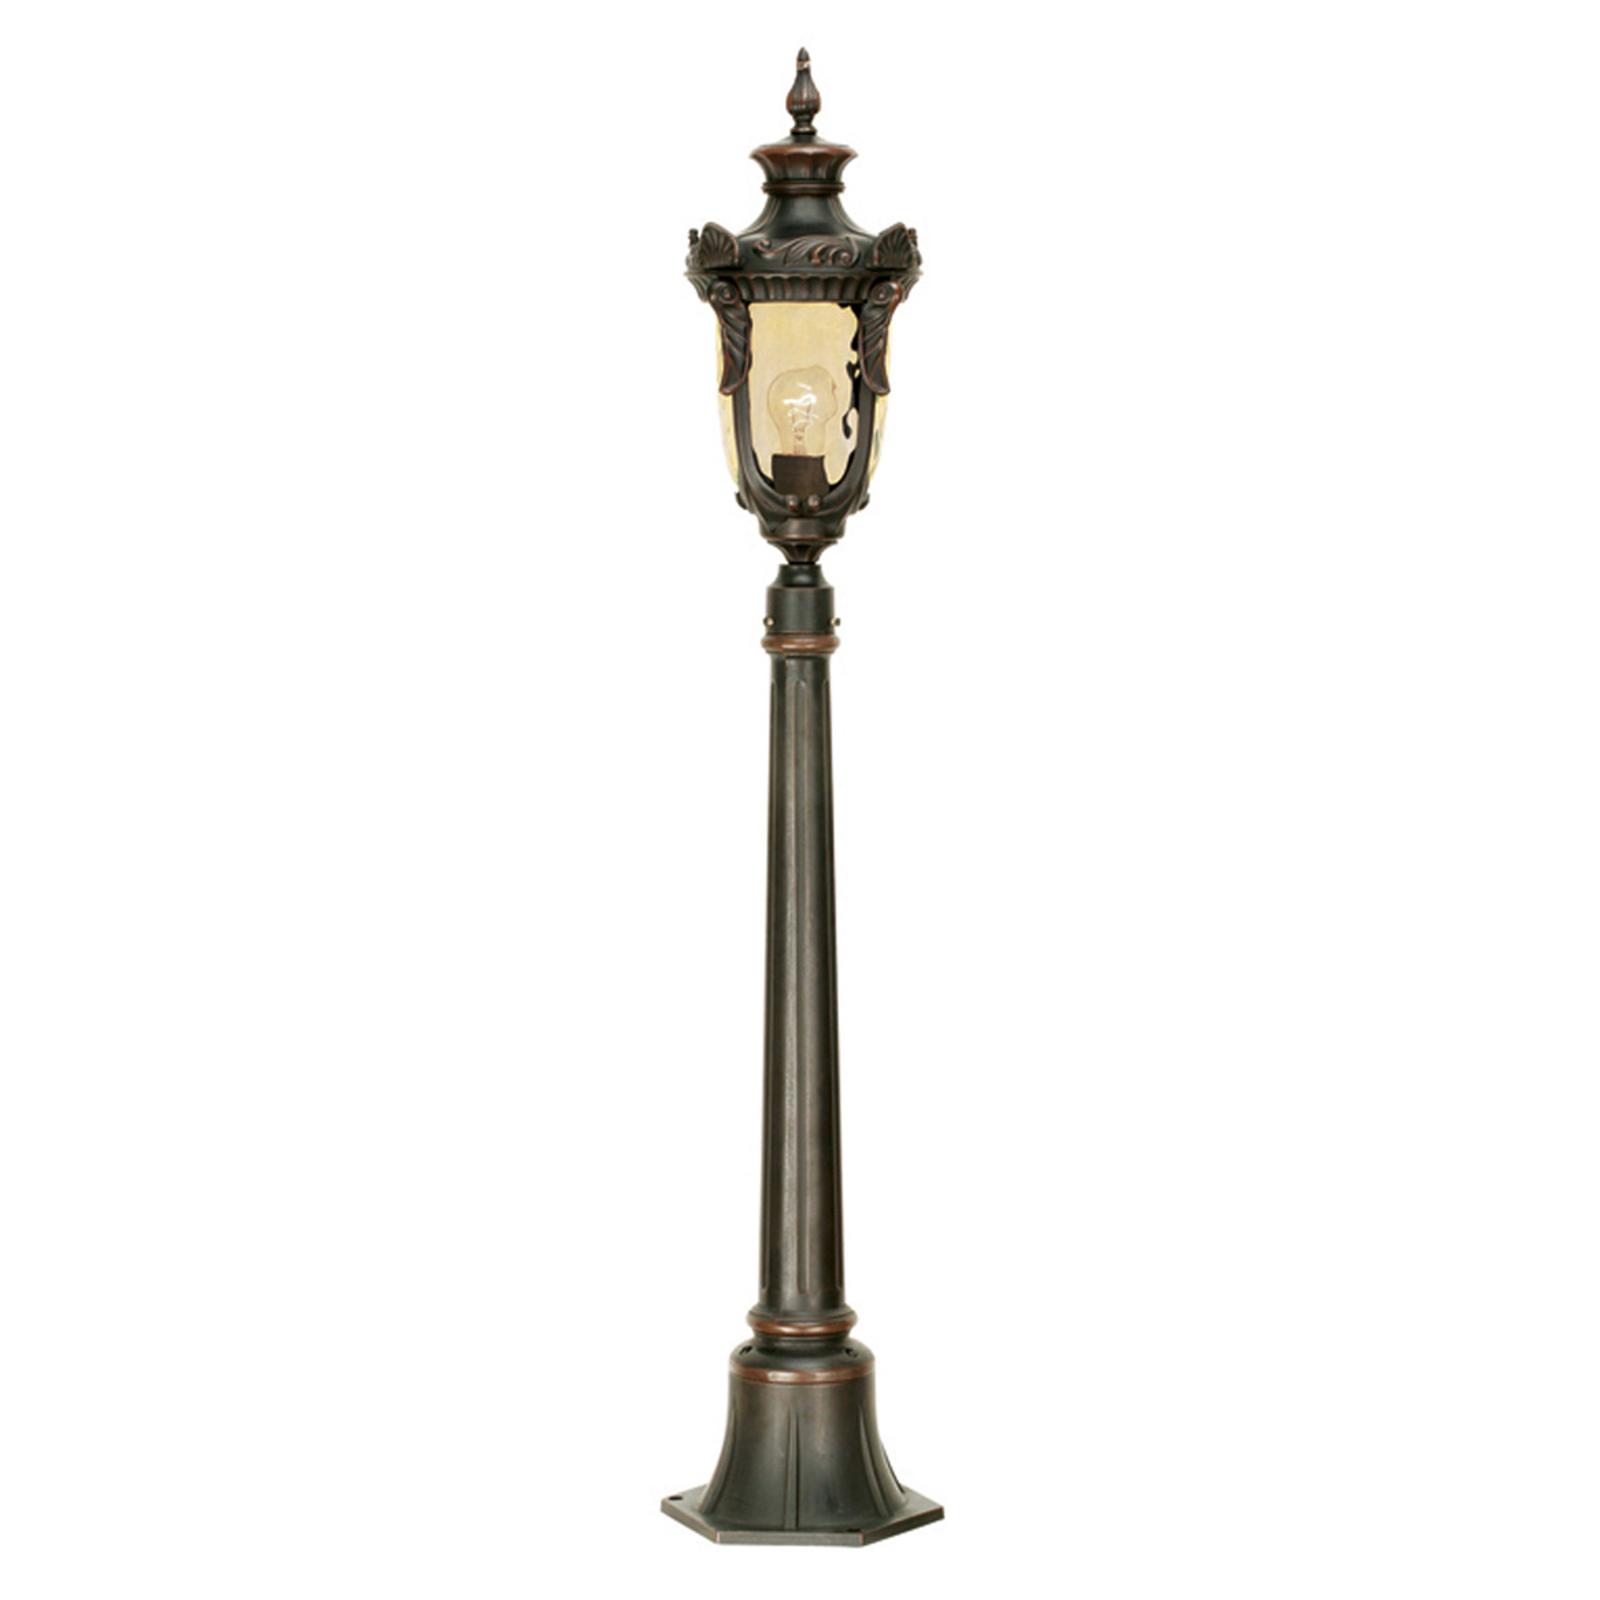 Philadelphia Path Light Historical Design_3048182_1